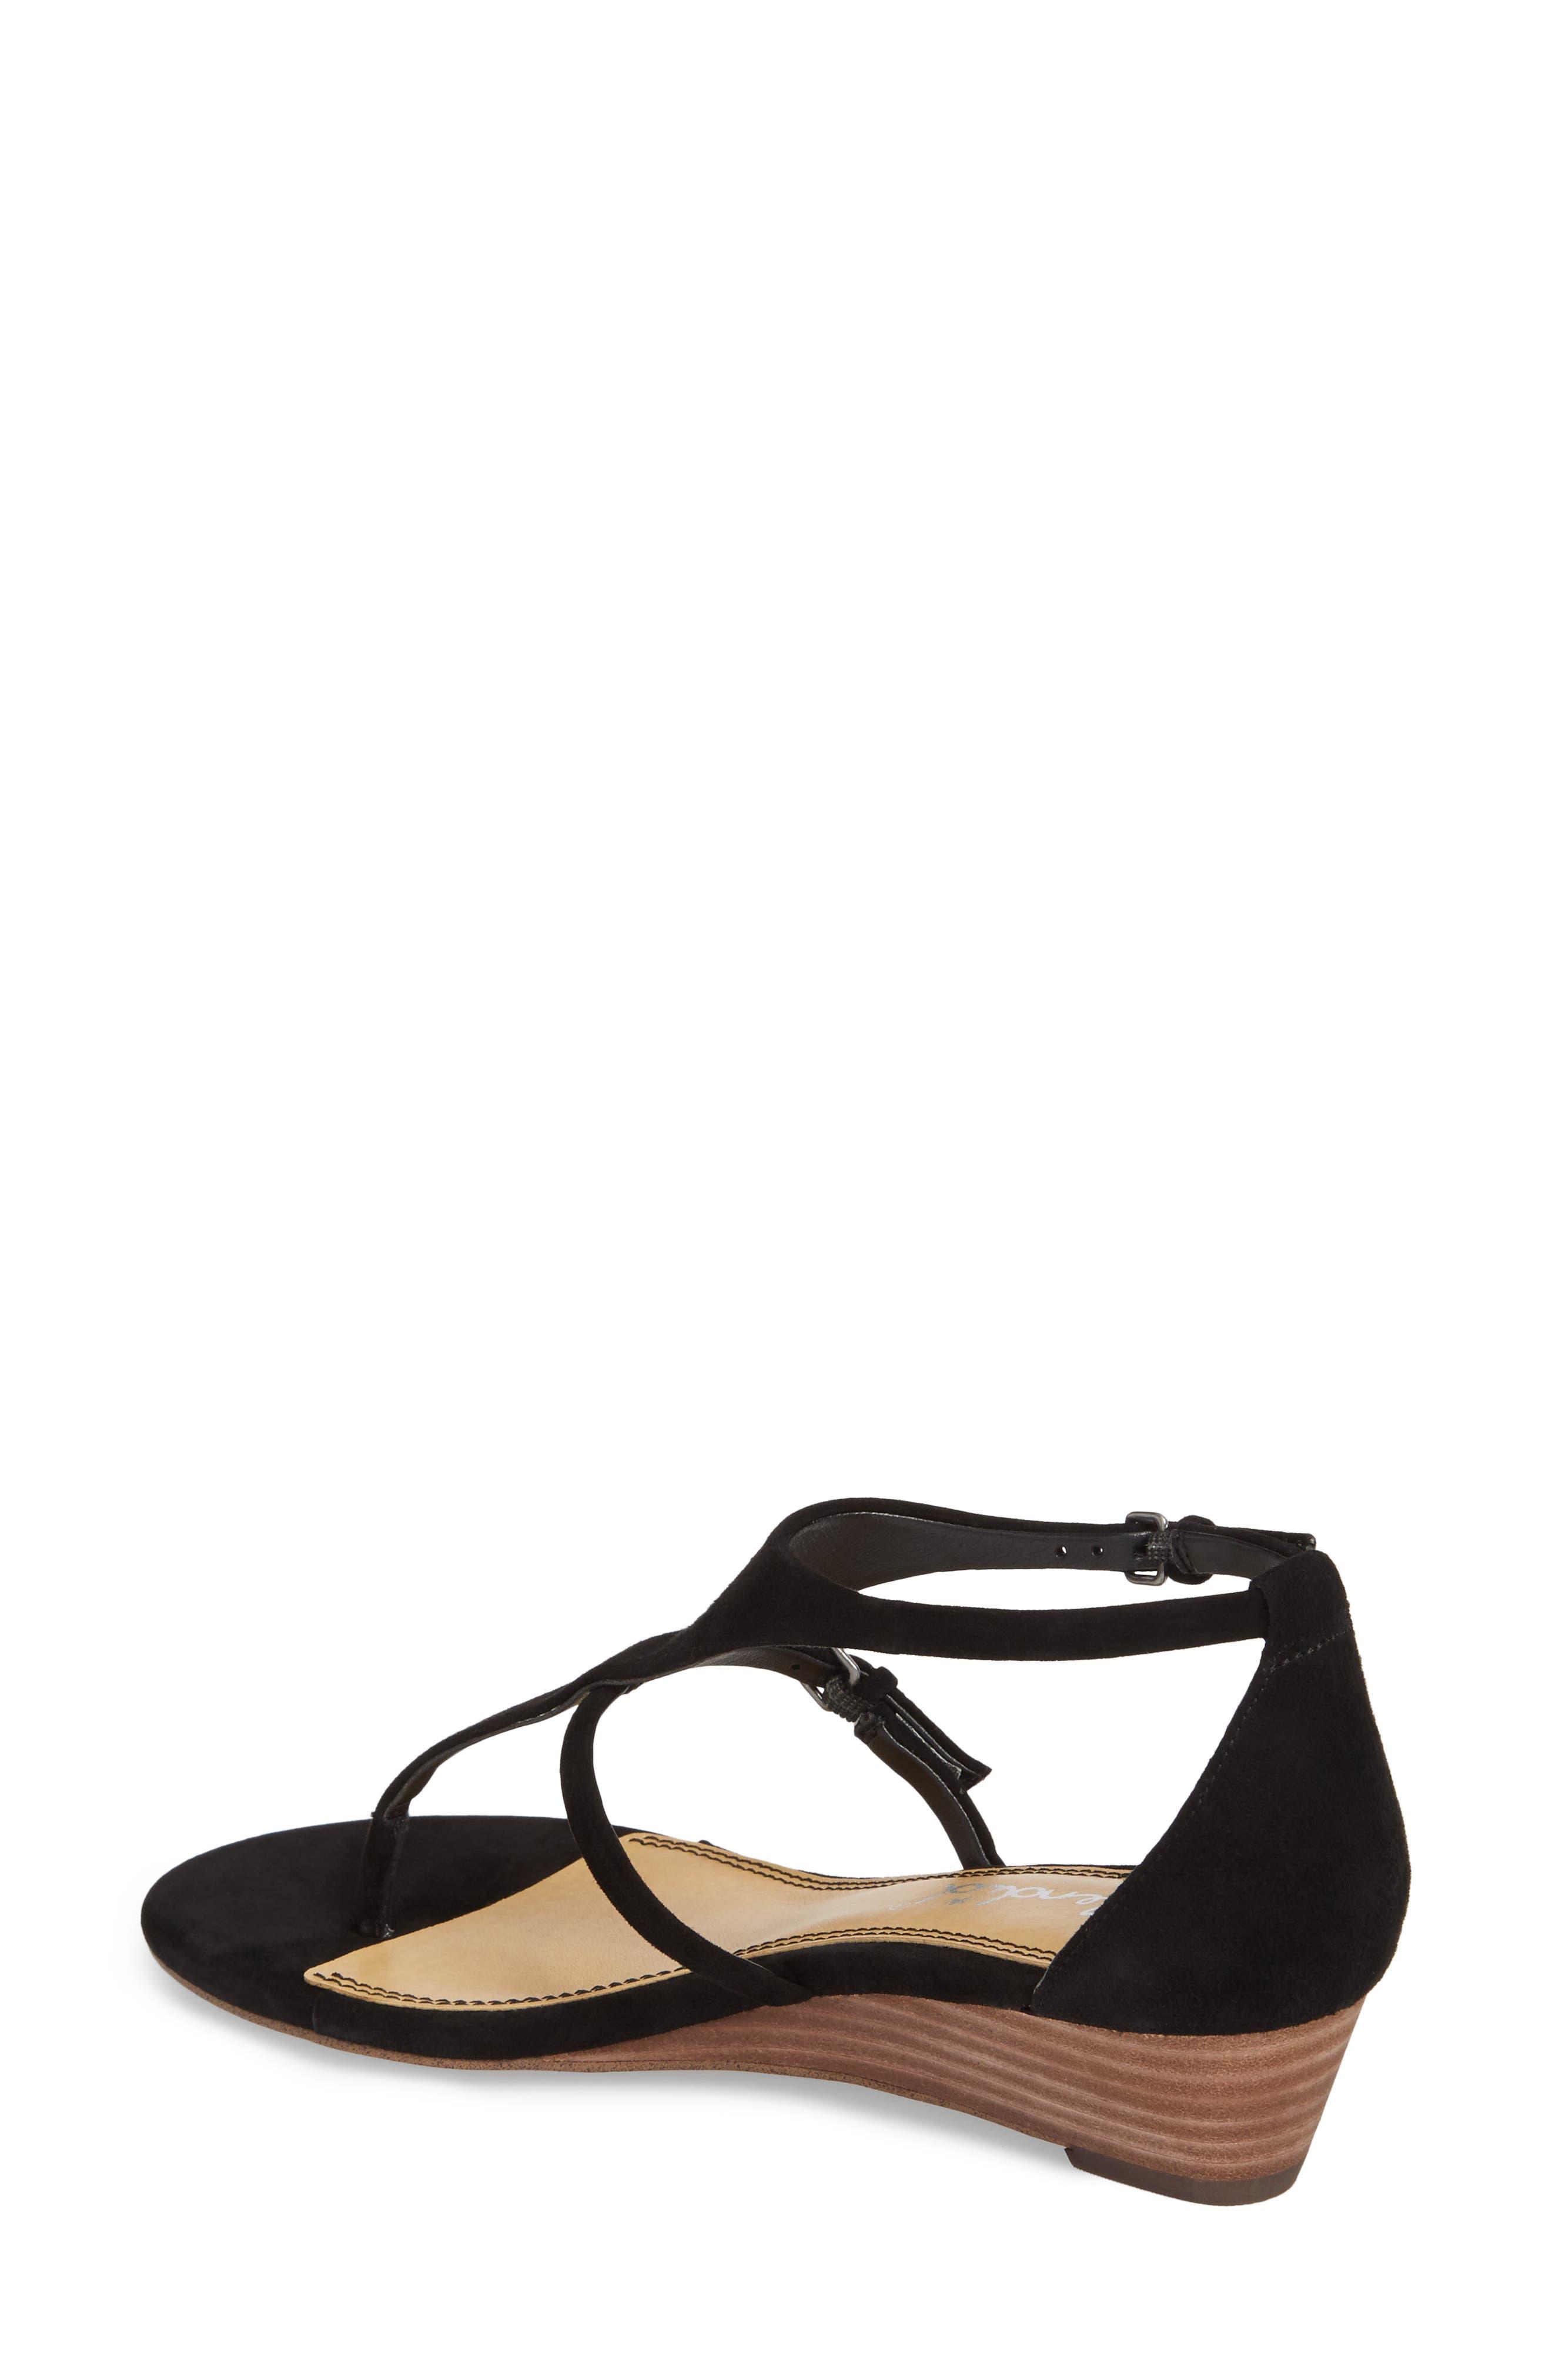 Brooklyn V-Strap Wedge Sandal,                             Alternate thumbnail 5, color,